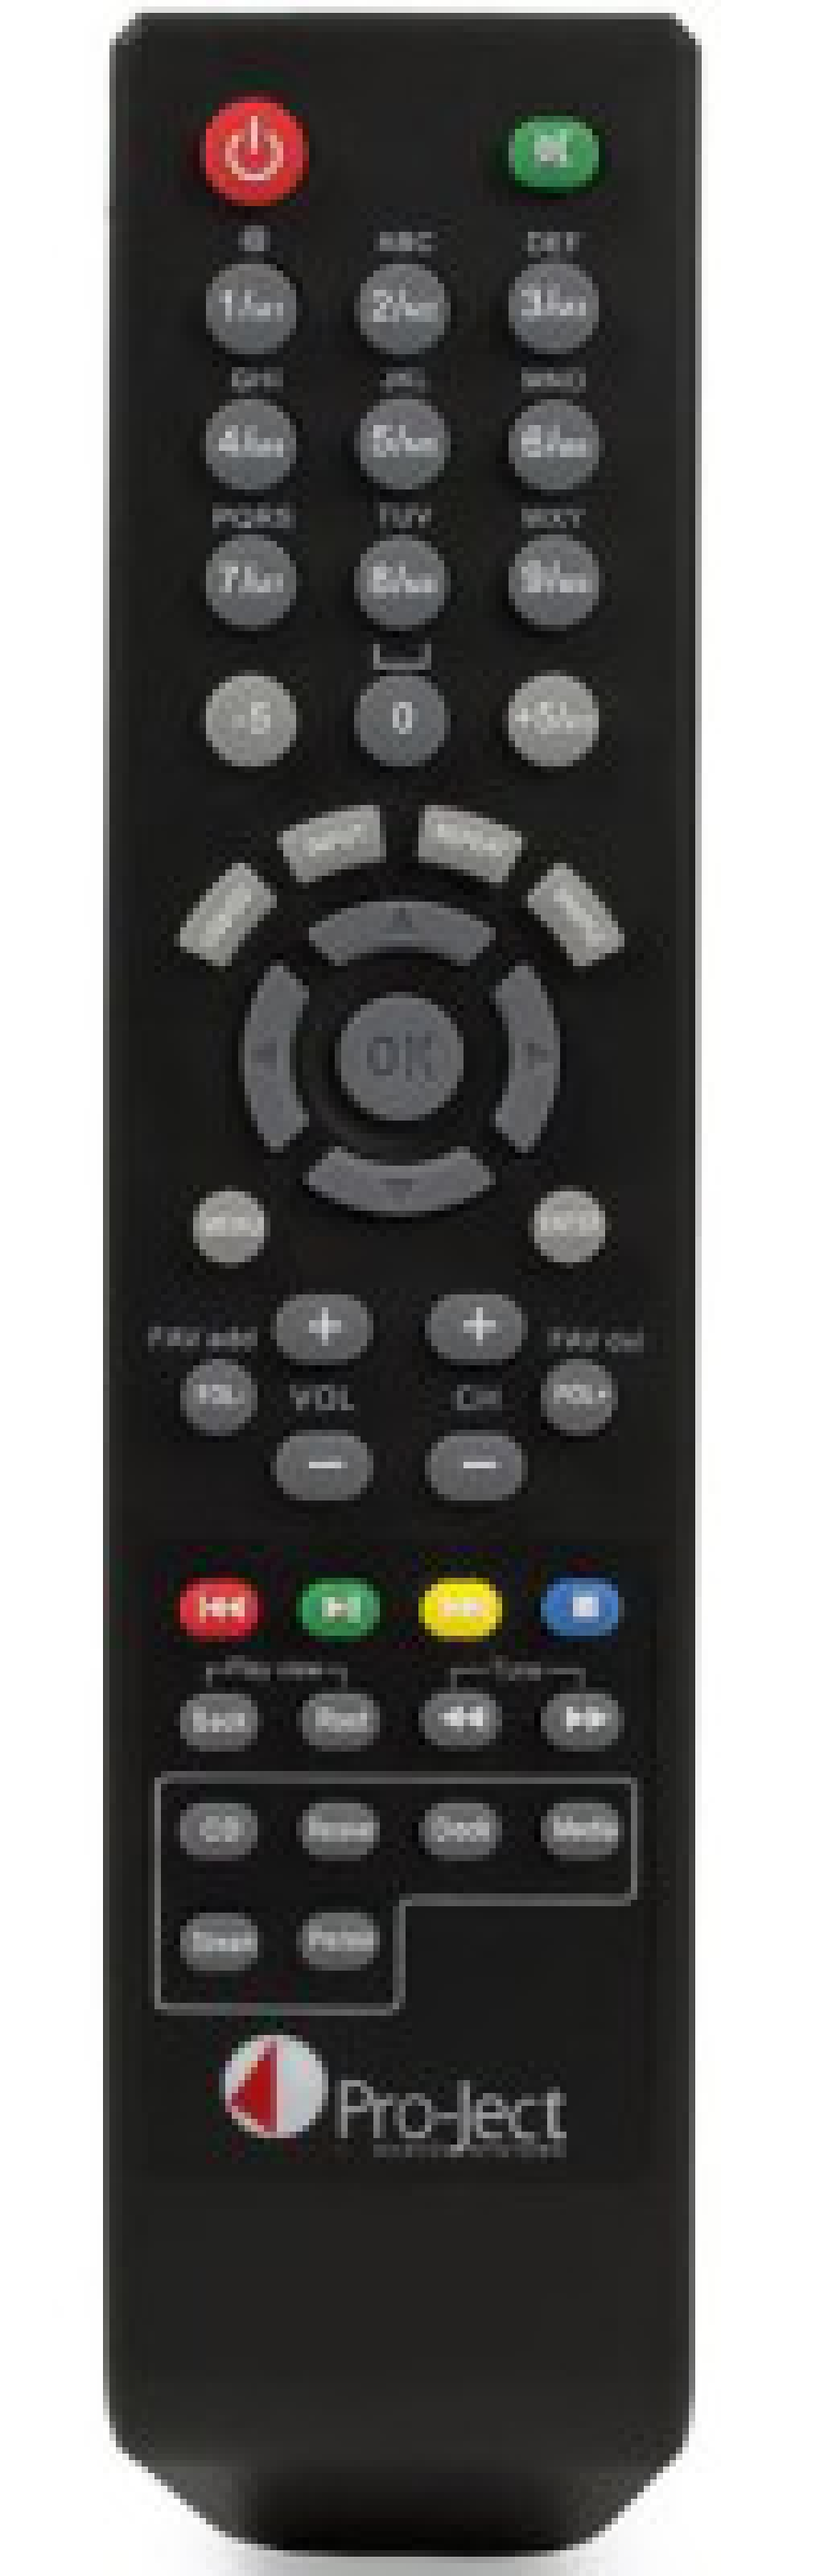 Telecomanda Pro-ject Control It